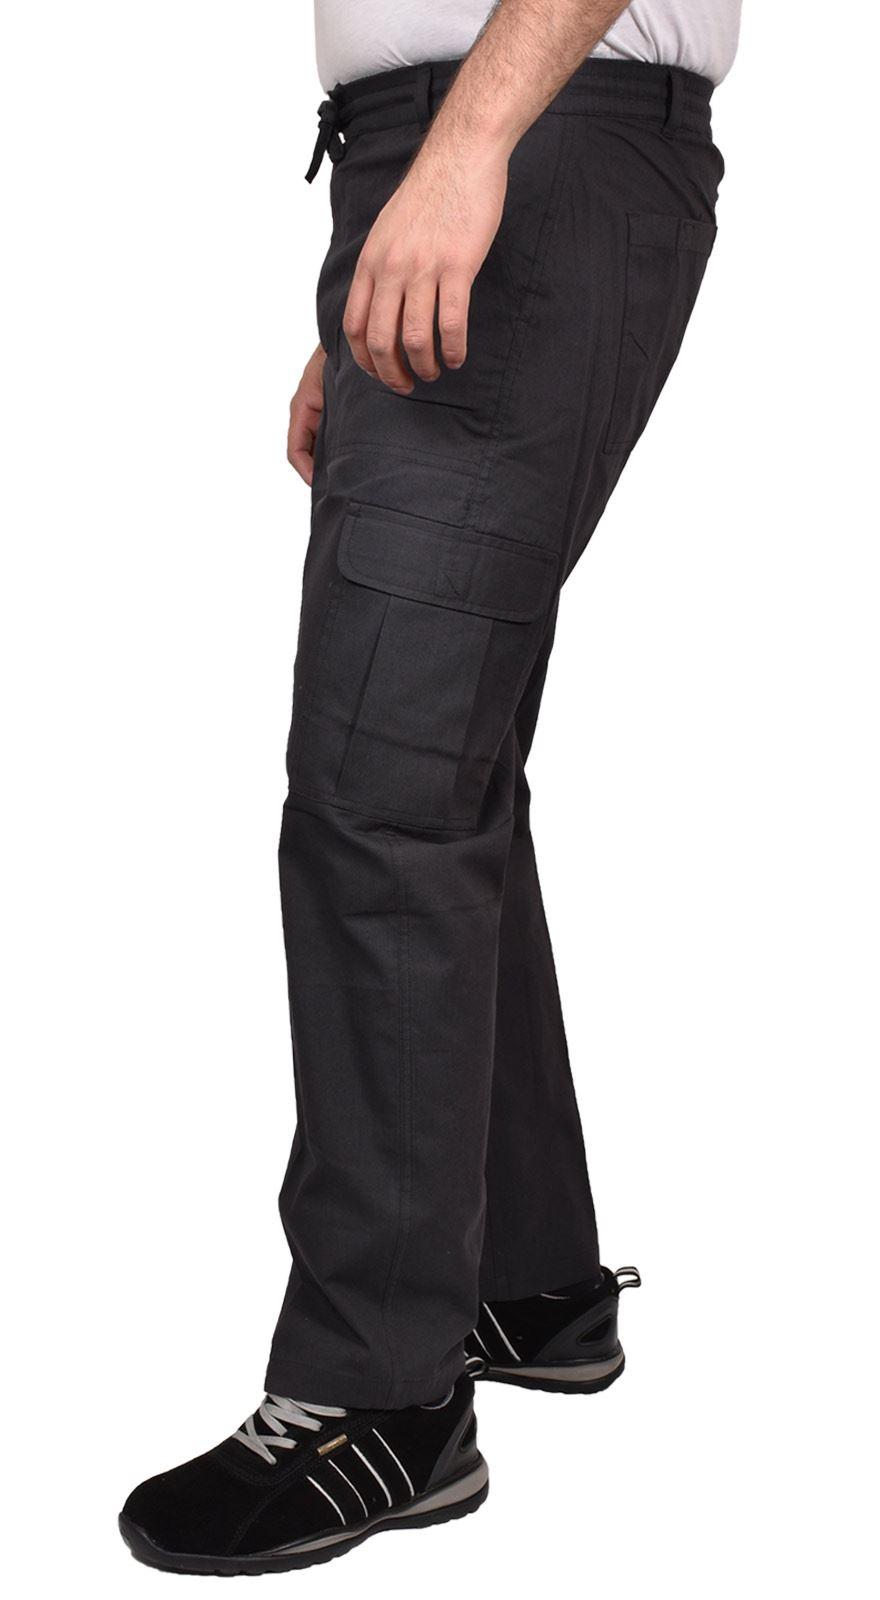 Para-Hombre-De-Carga-Combate-Pantalones-De-Trabajo-Bolsillos-Patrulla-Tactico-Pro-Algodon-Pantalones miniatura 7